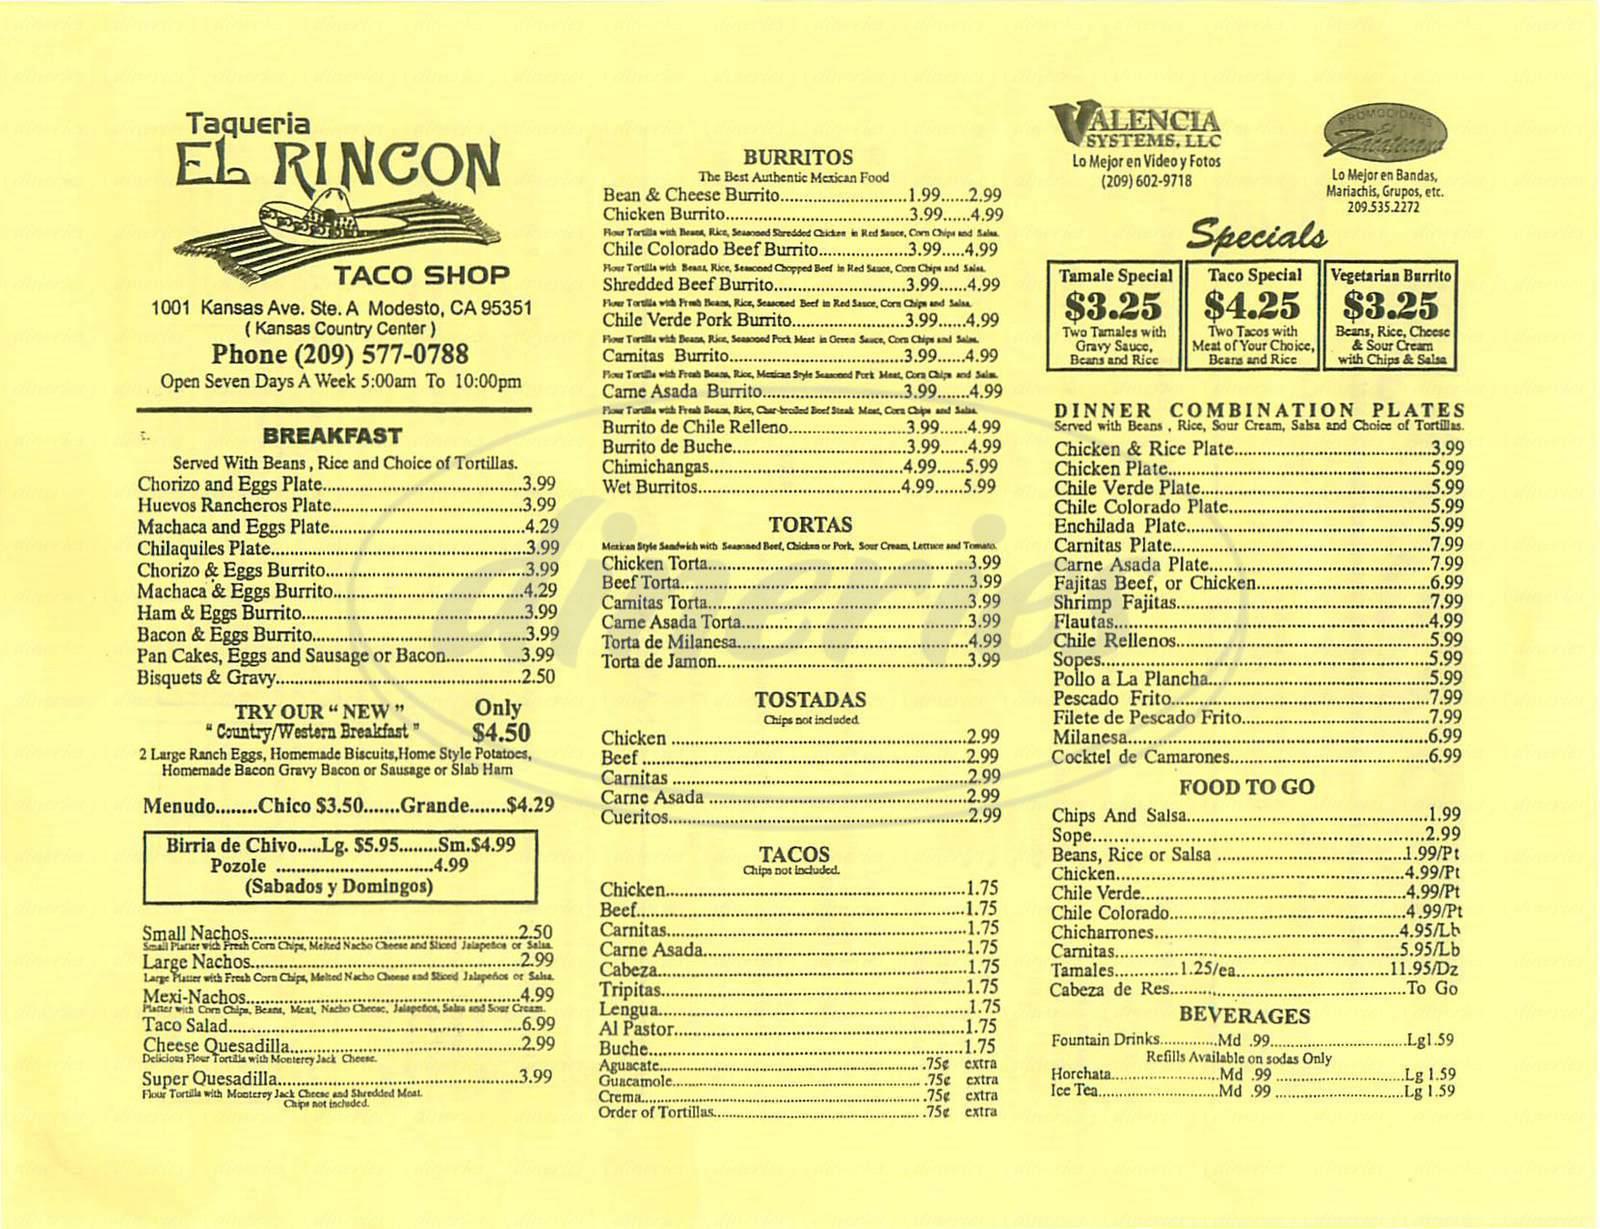 menu for Taqueria El Rincon